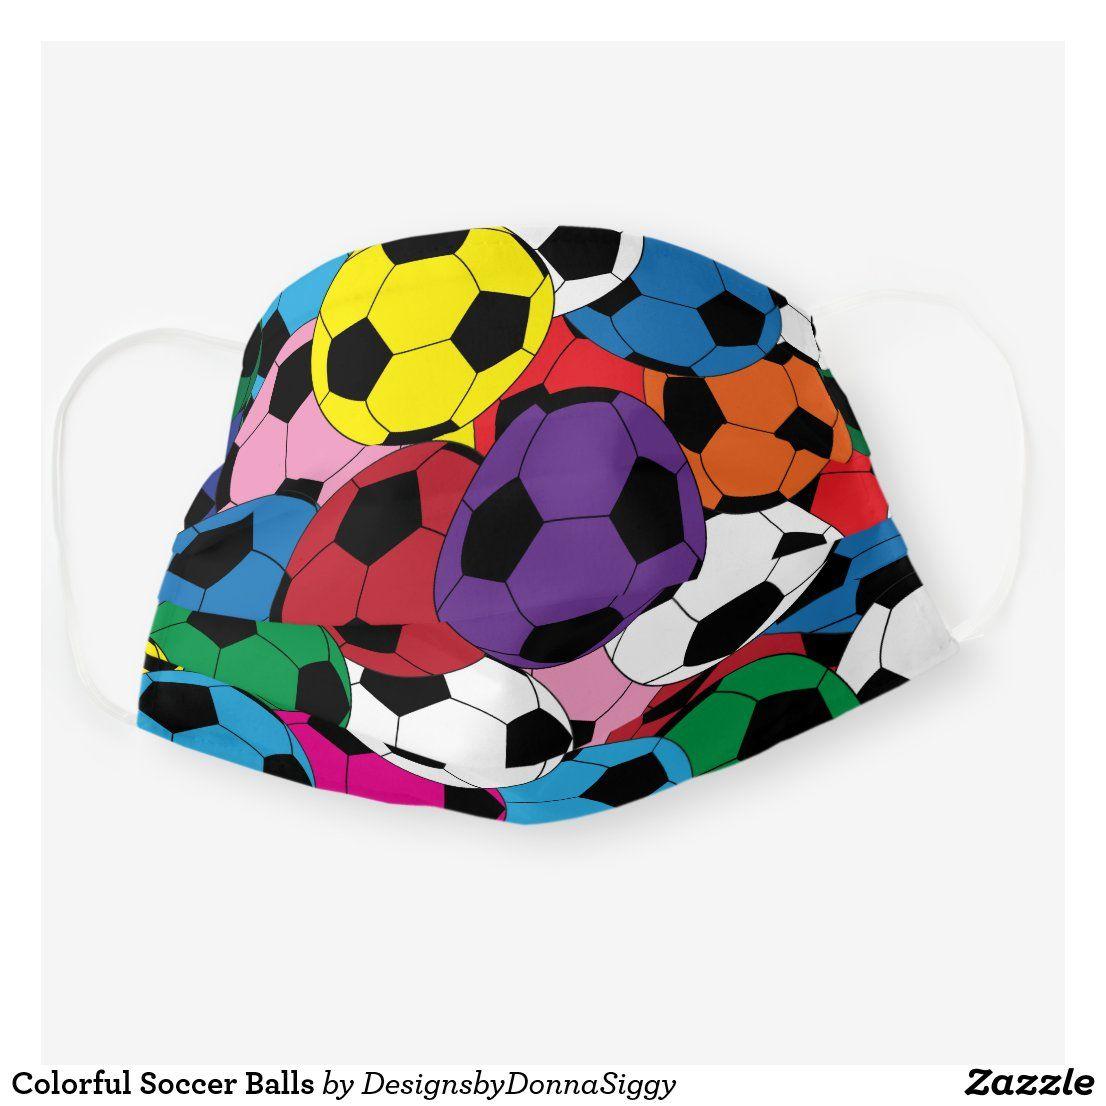 Colorful Soccer Balls Cloth Face Mask Zazzle Com In 2020 Soccer Balls Face Mask Gifts For Sports Fans